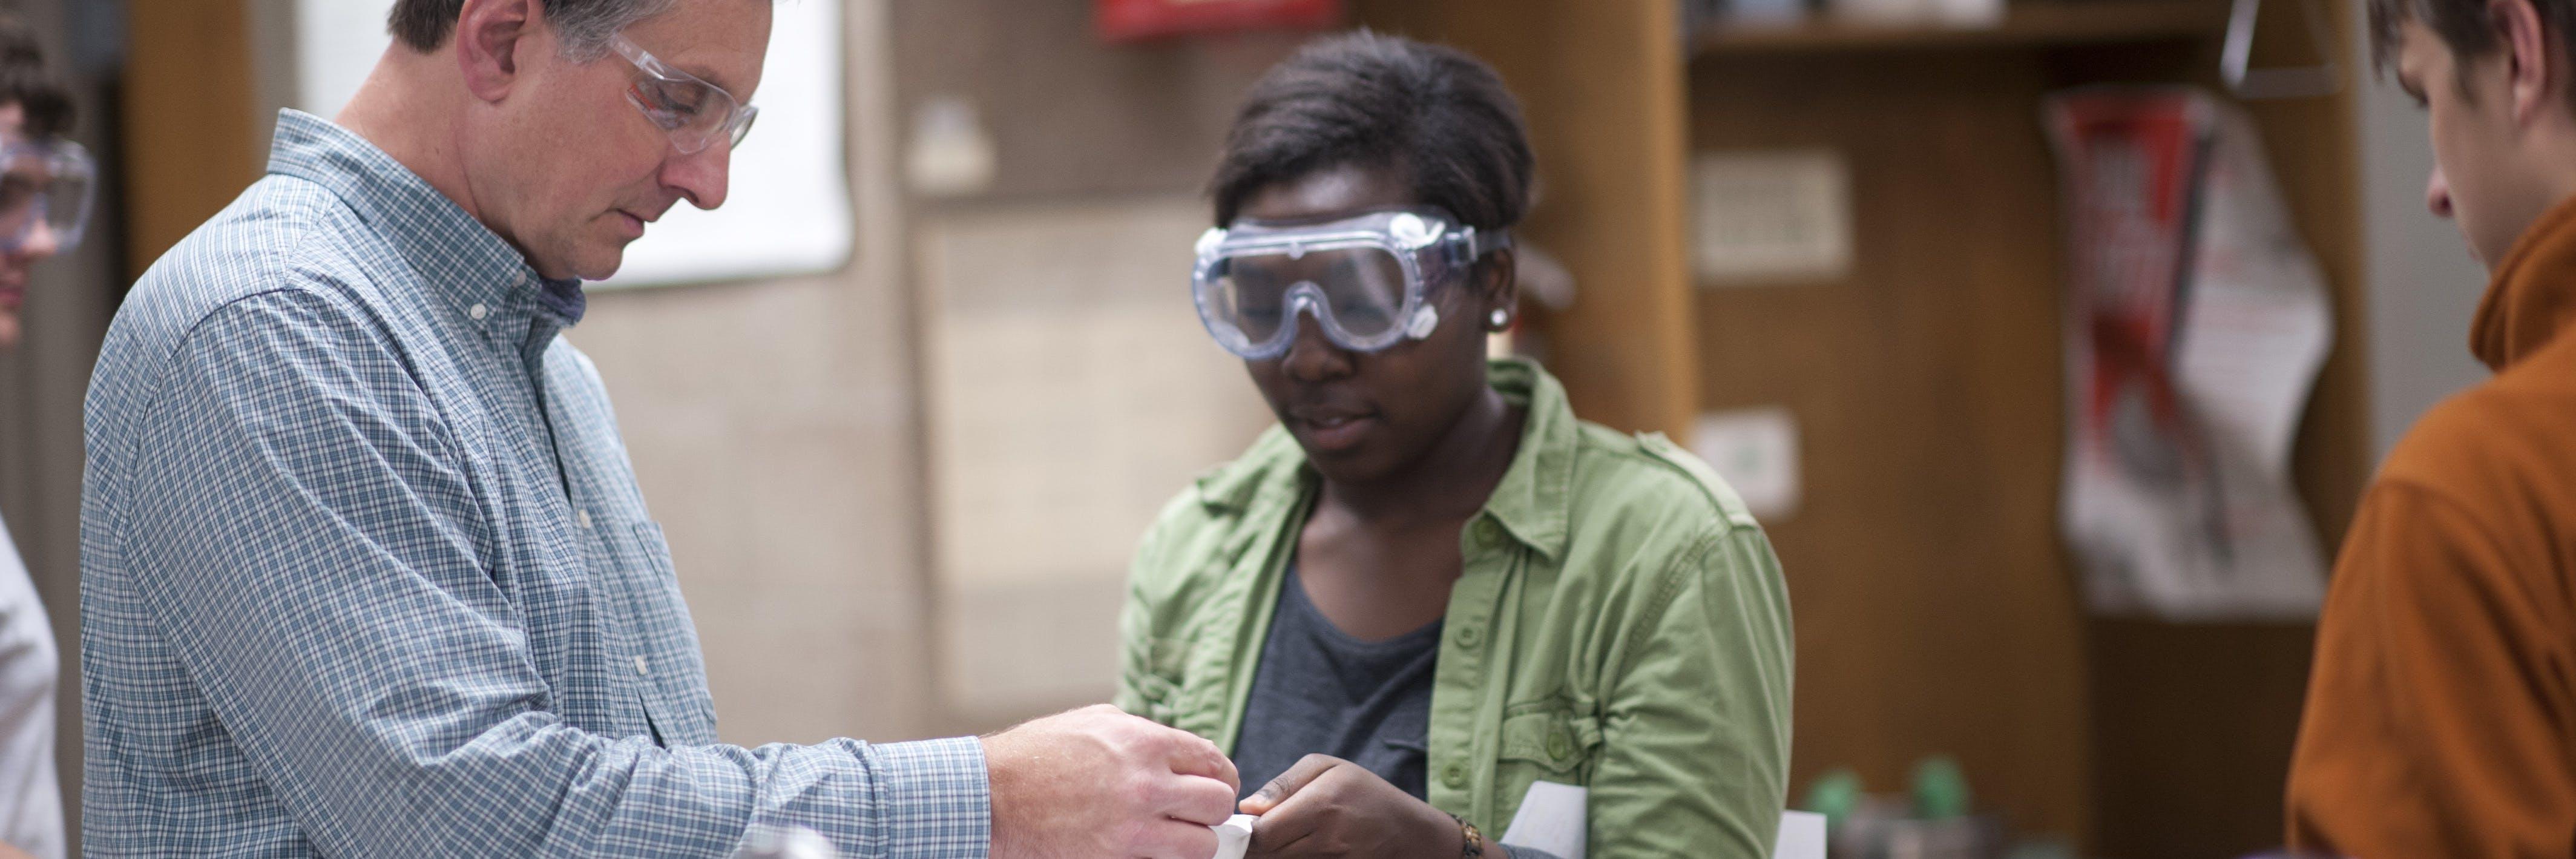 A professor helping a student